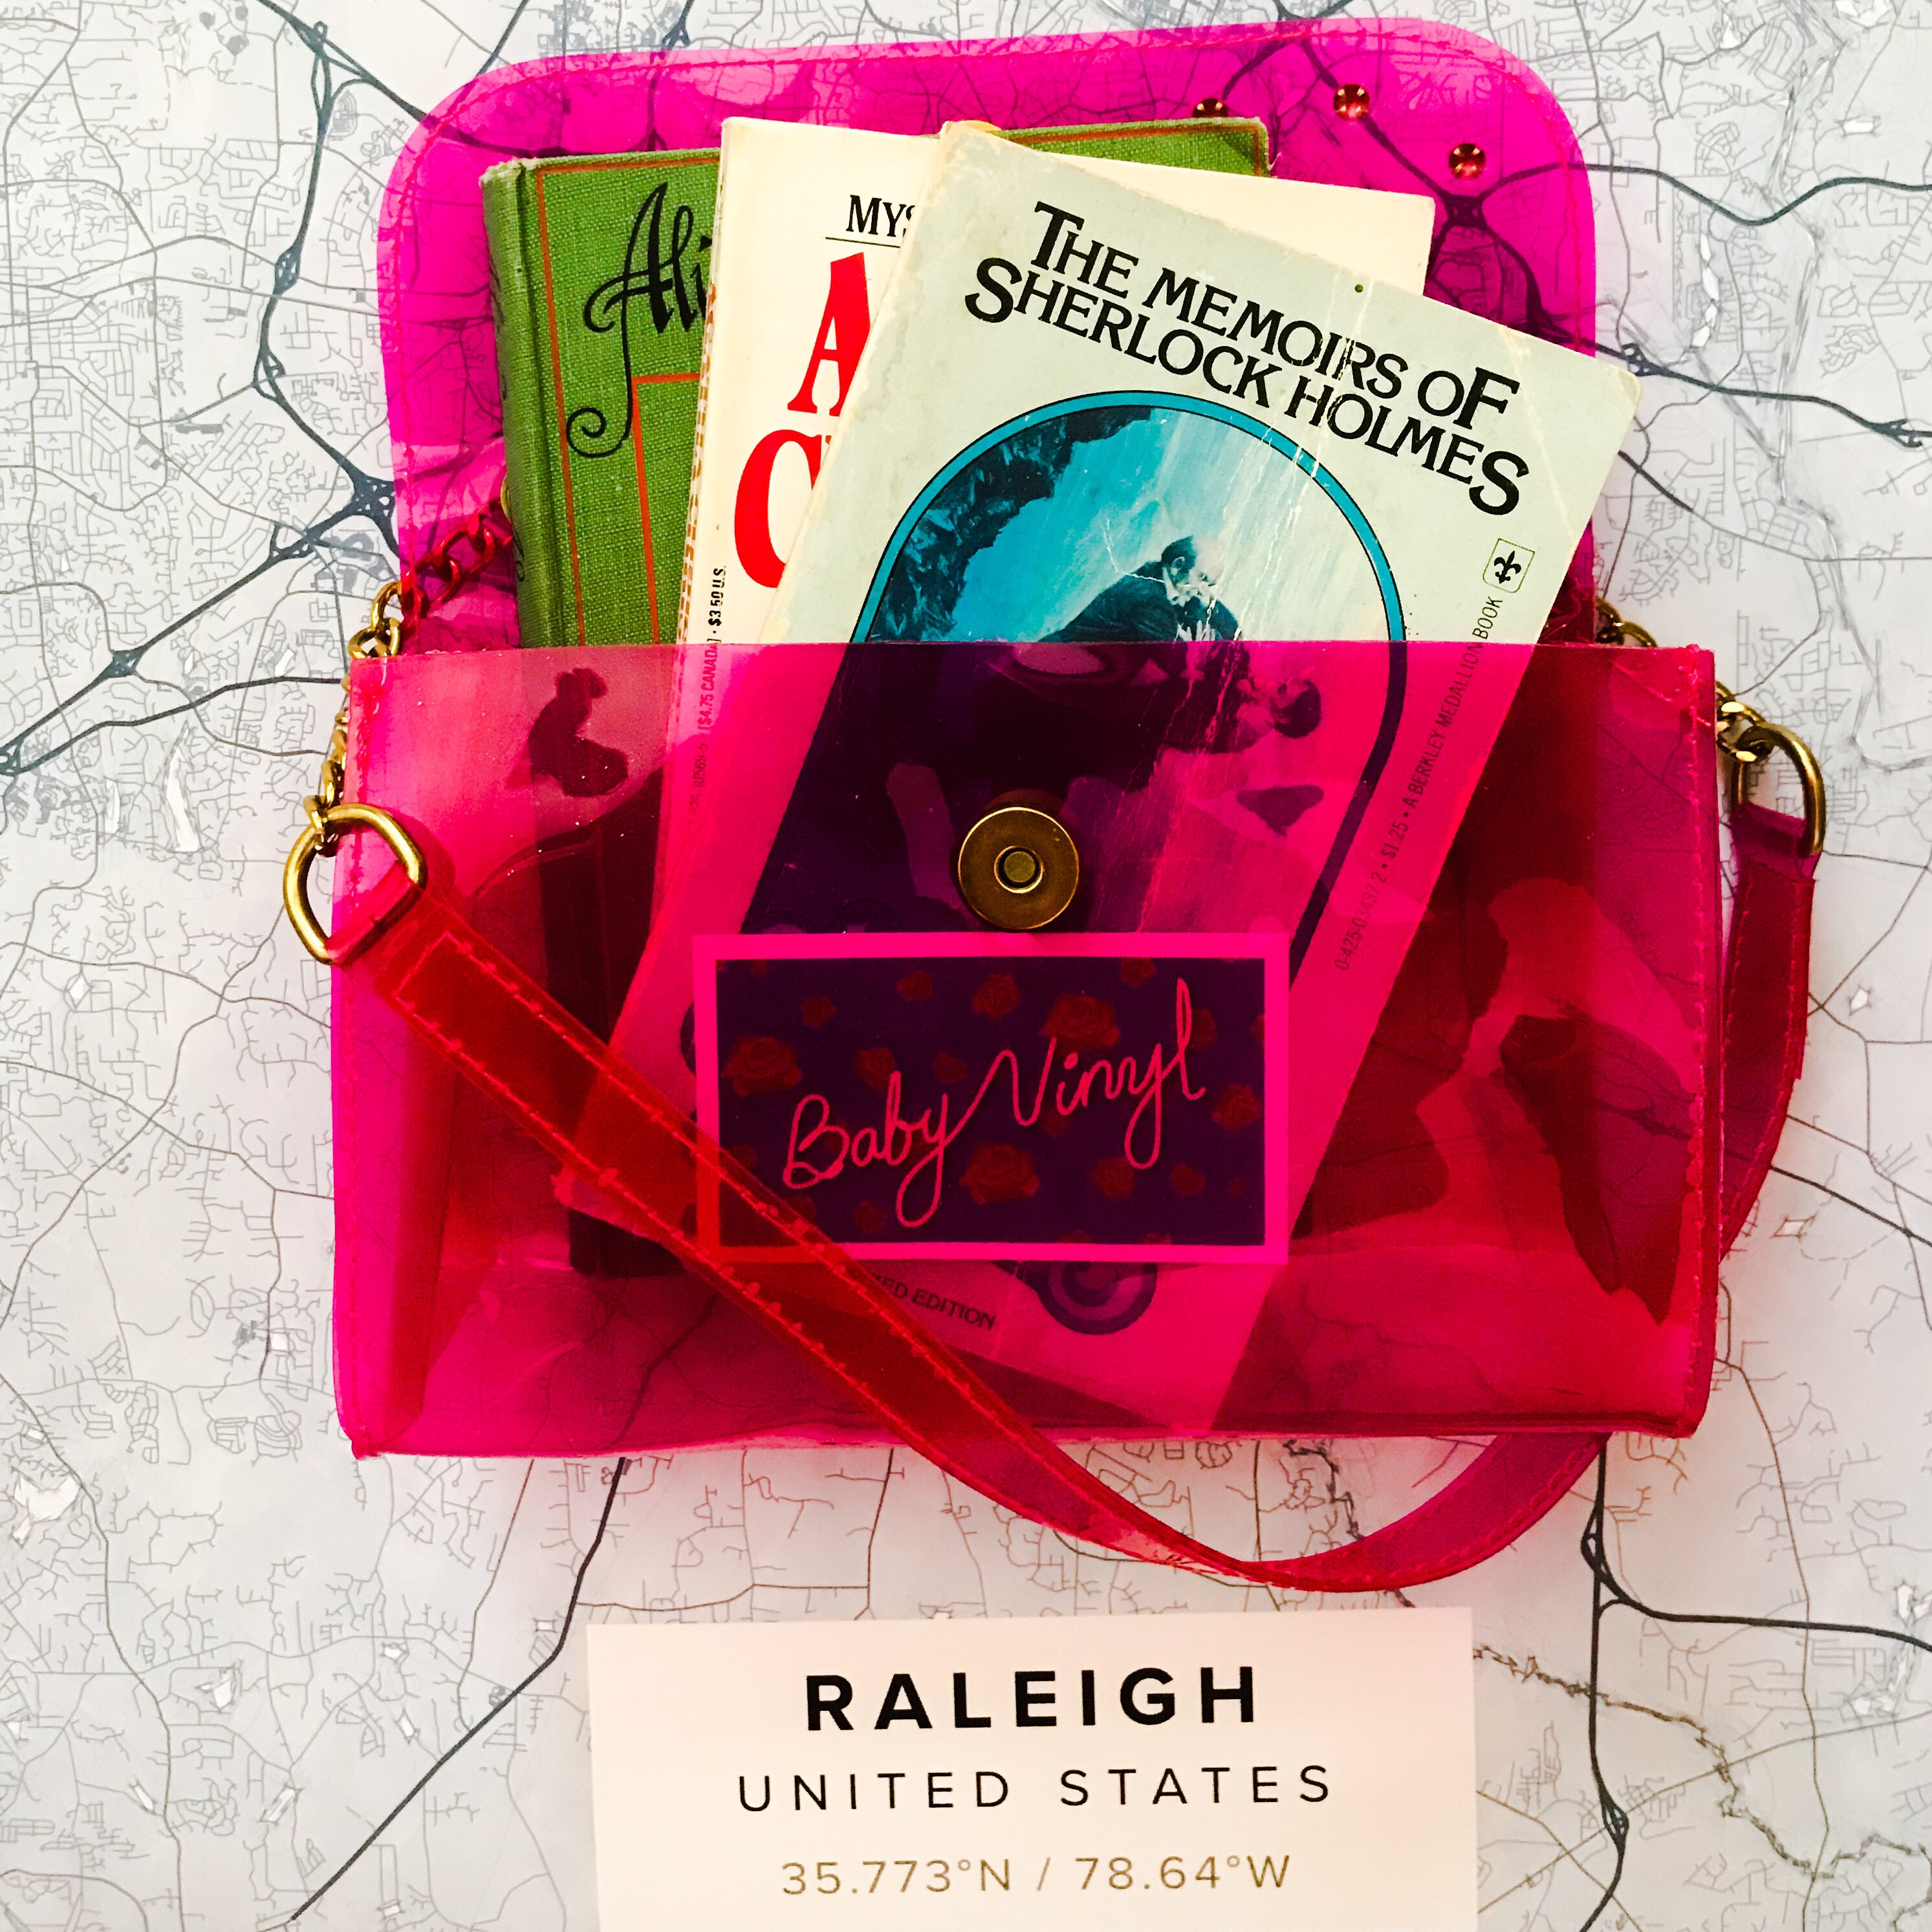 Hot pink vinyl fashion purse